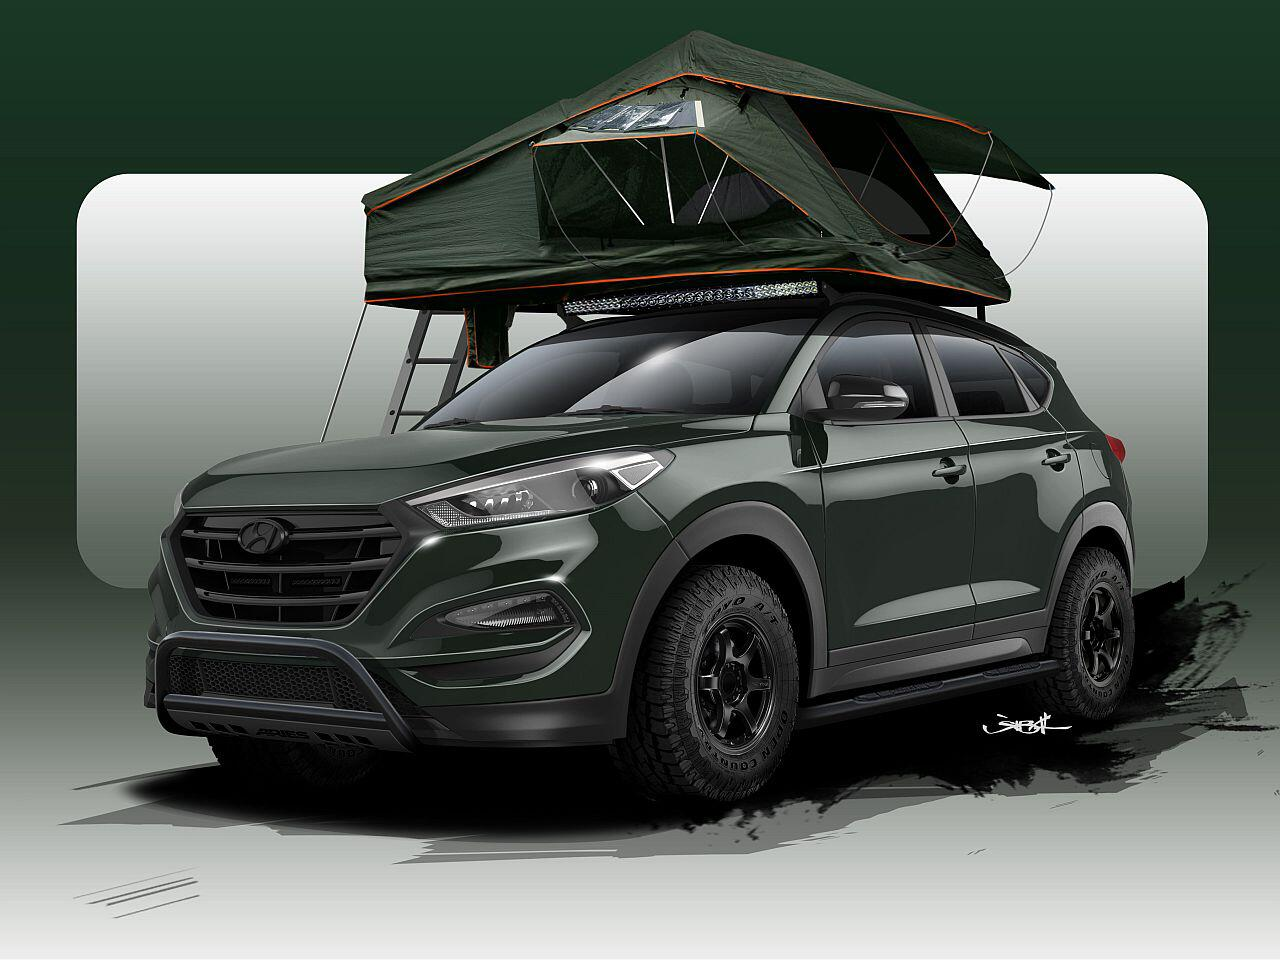 Bild zu Hyundai Tucson von Tuner John Pangilinan